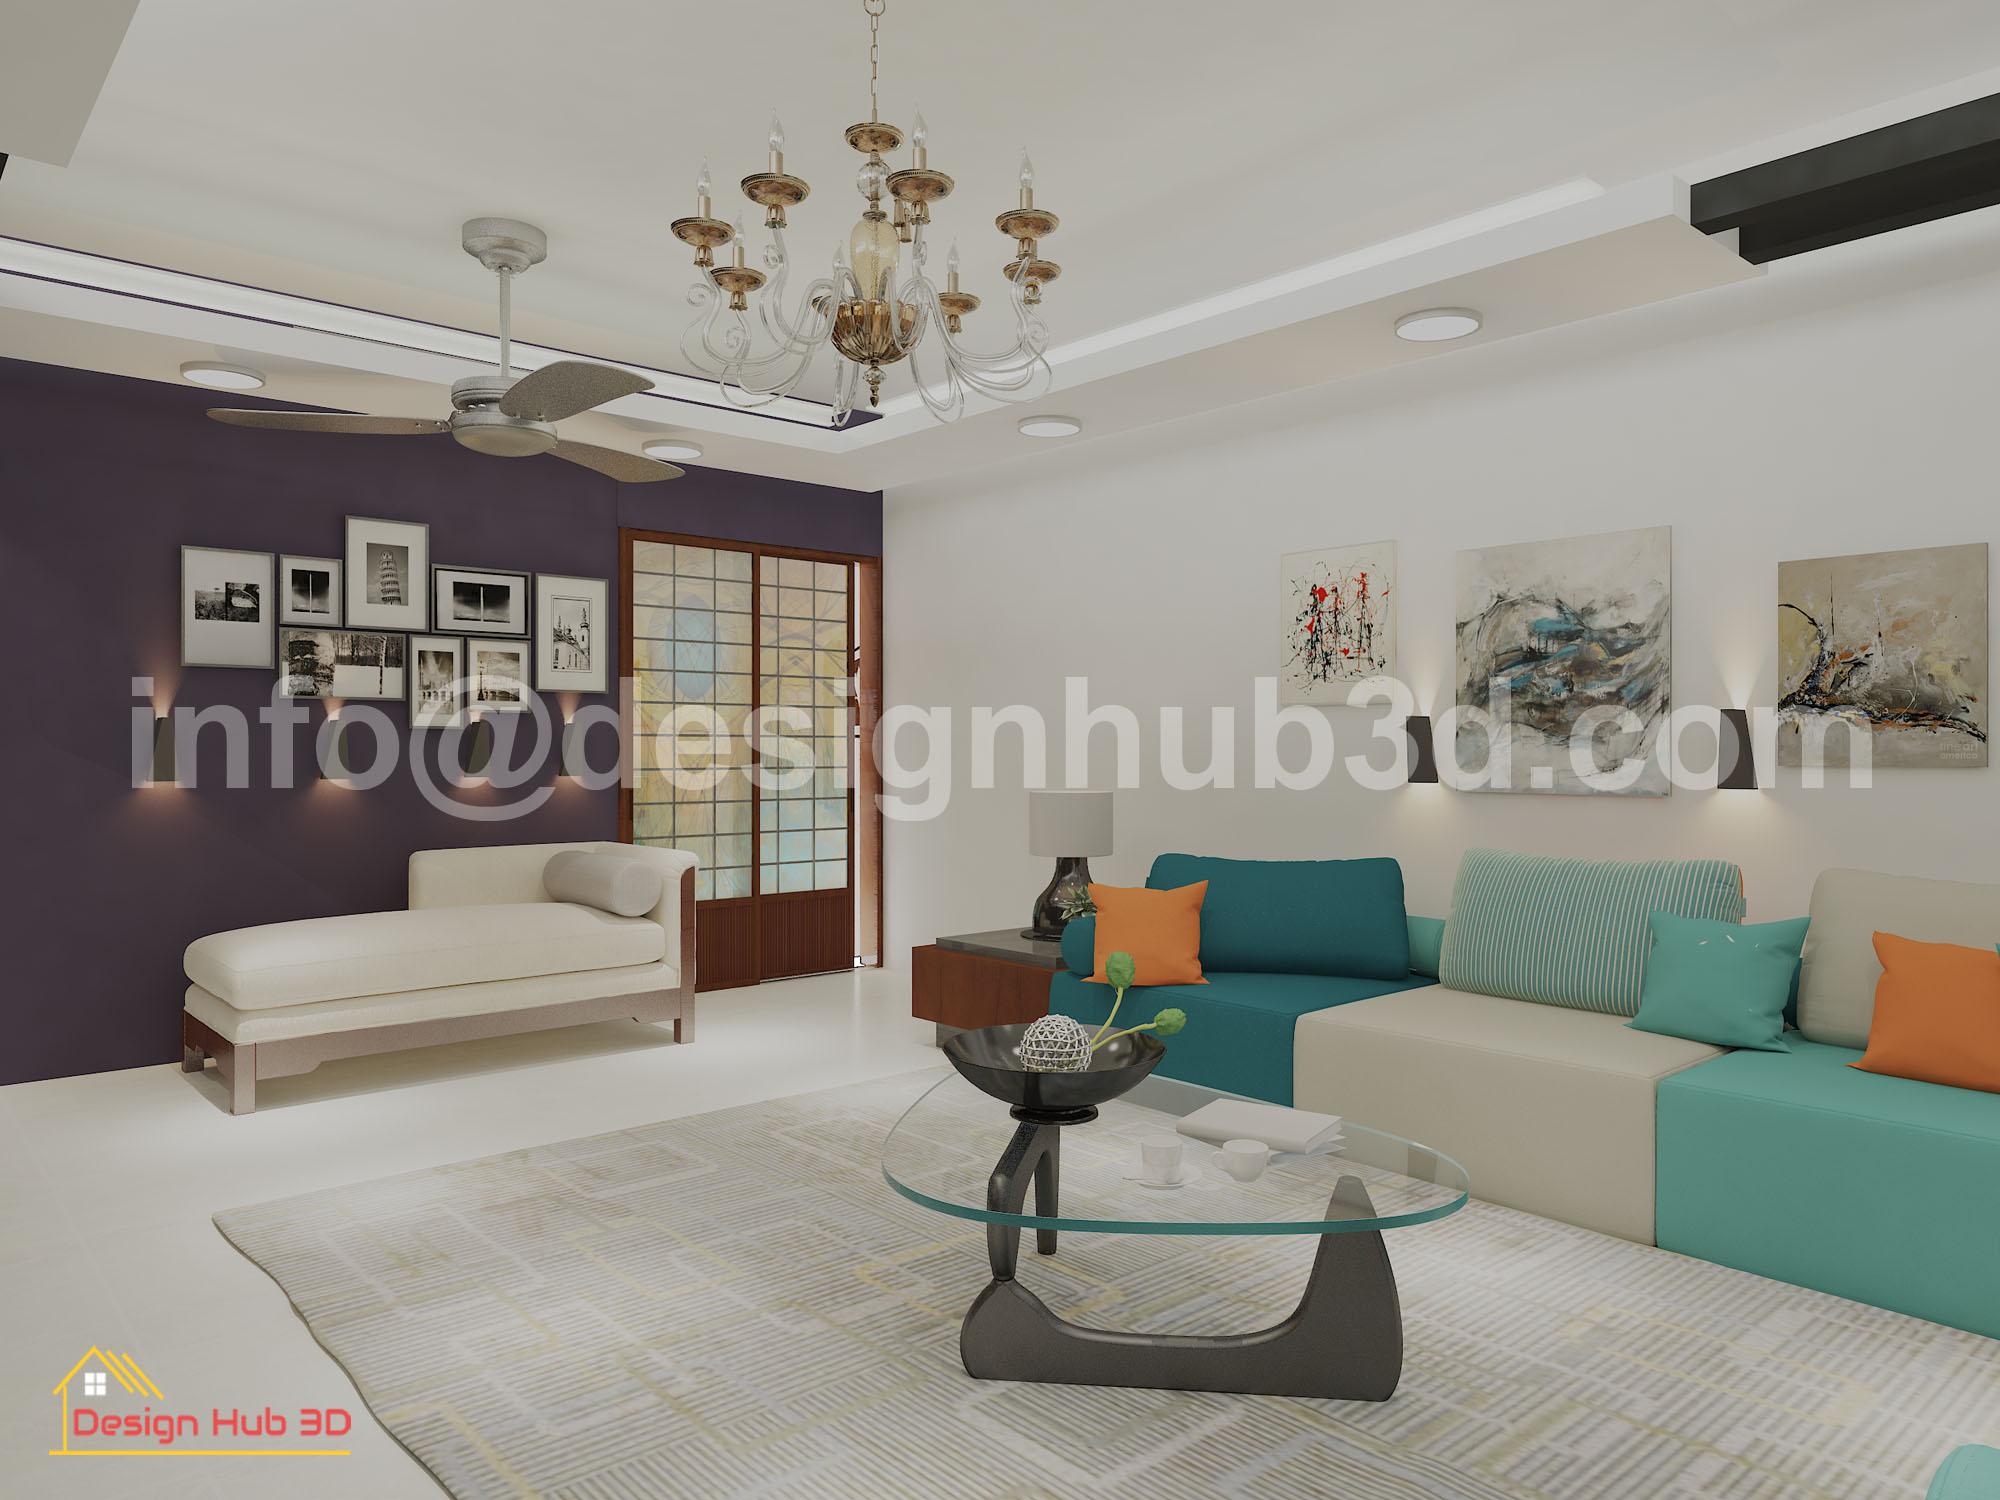 Designhub3d-home decor, drawing interior, living room,interior design